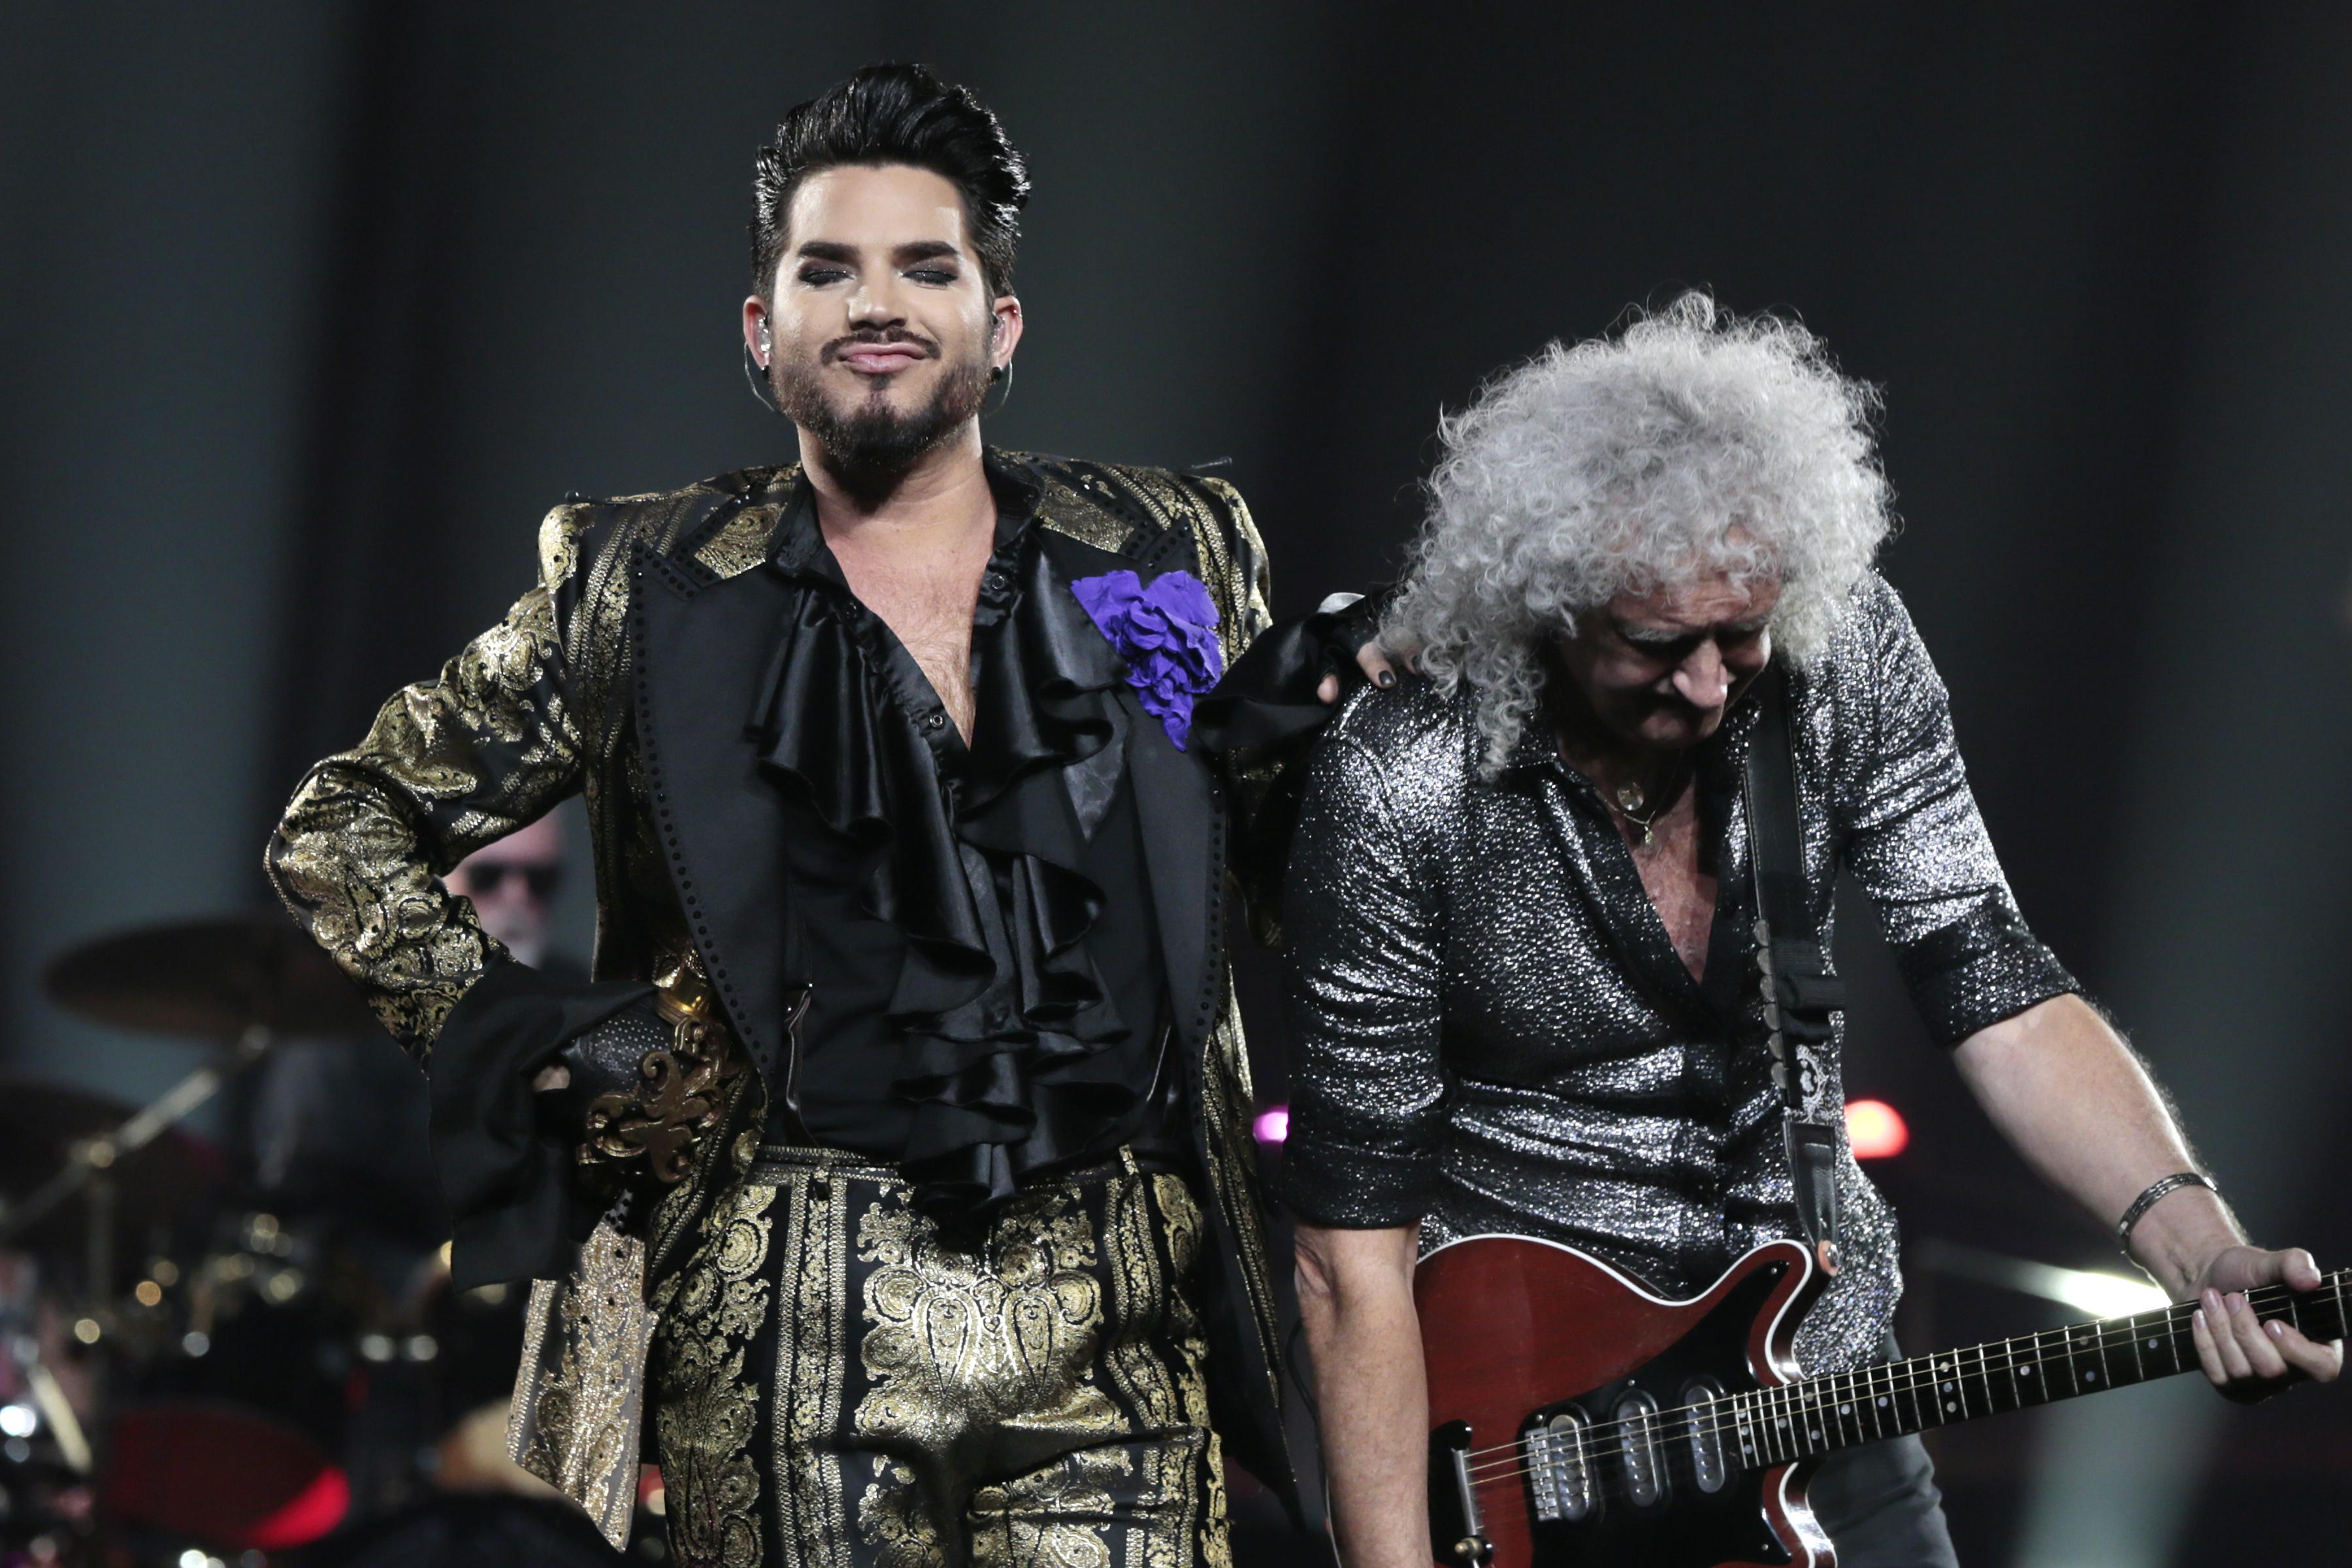 Queen's second reign continues with Adam Lambert at the Wells Fargo